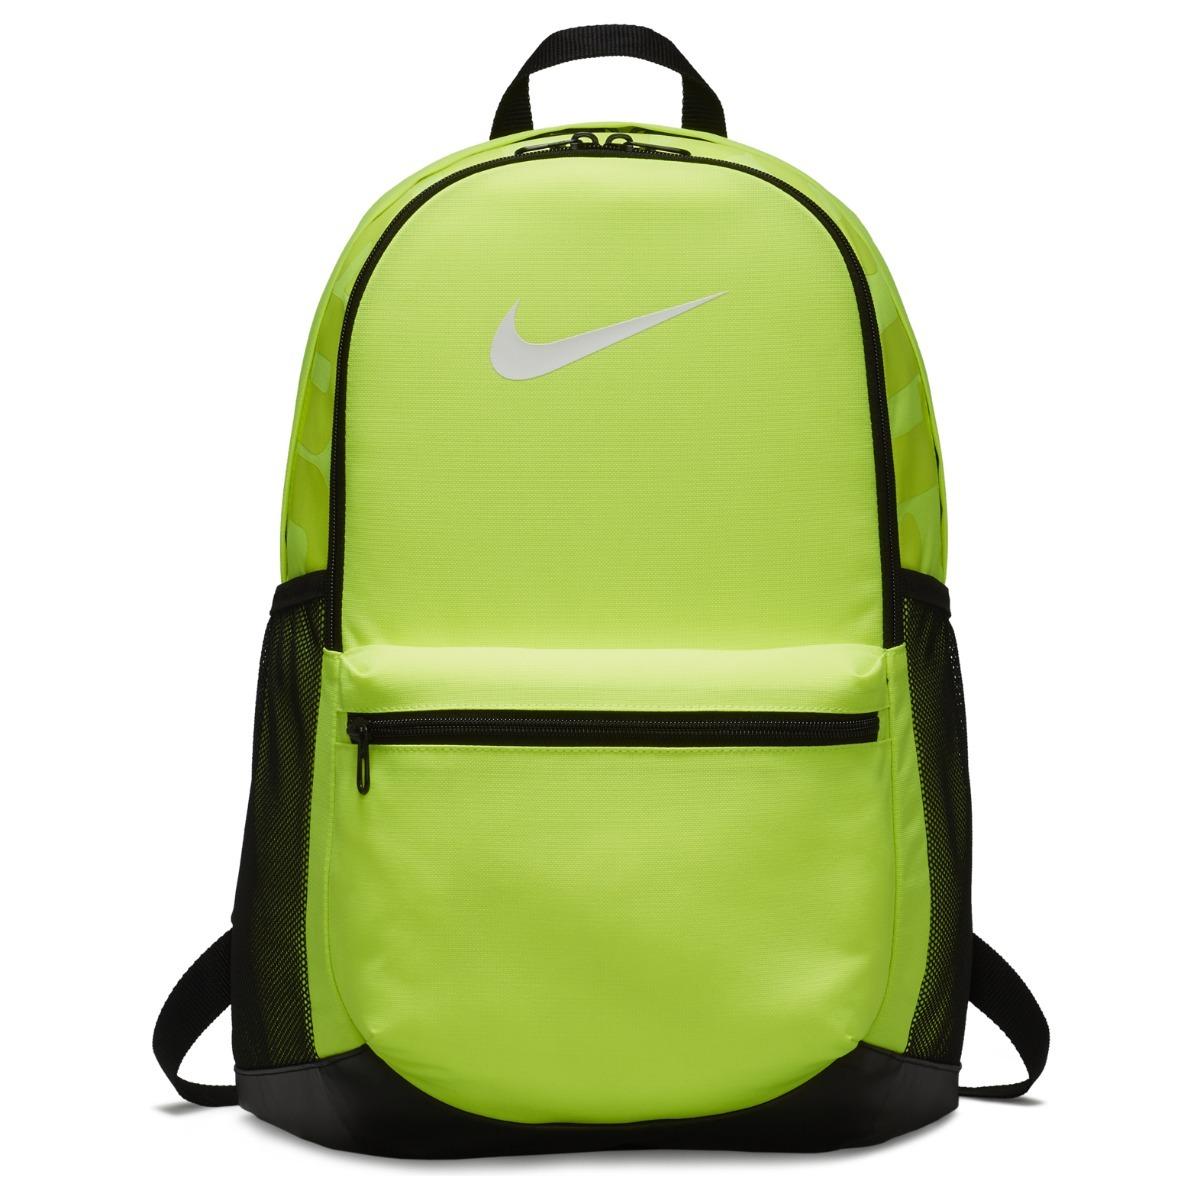 d90741c48 Mochila Nike Brasilia Medium Neon -   954.00 en Mercado Libre